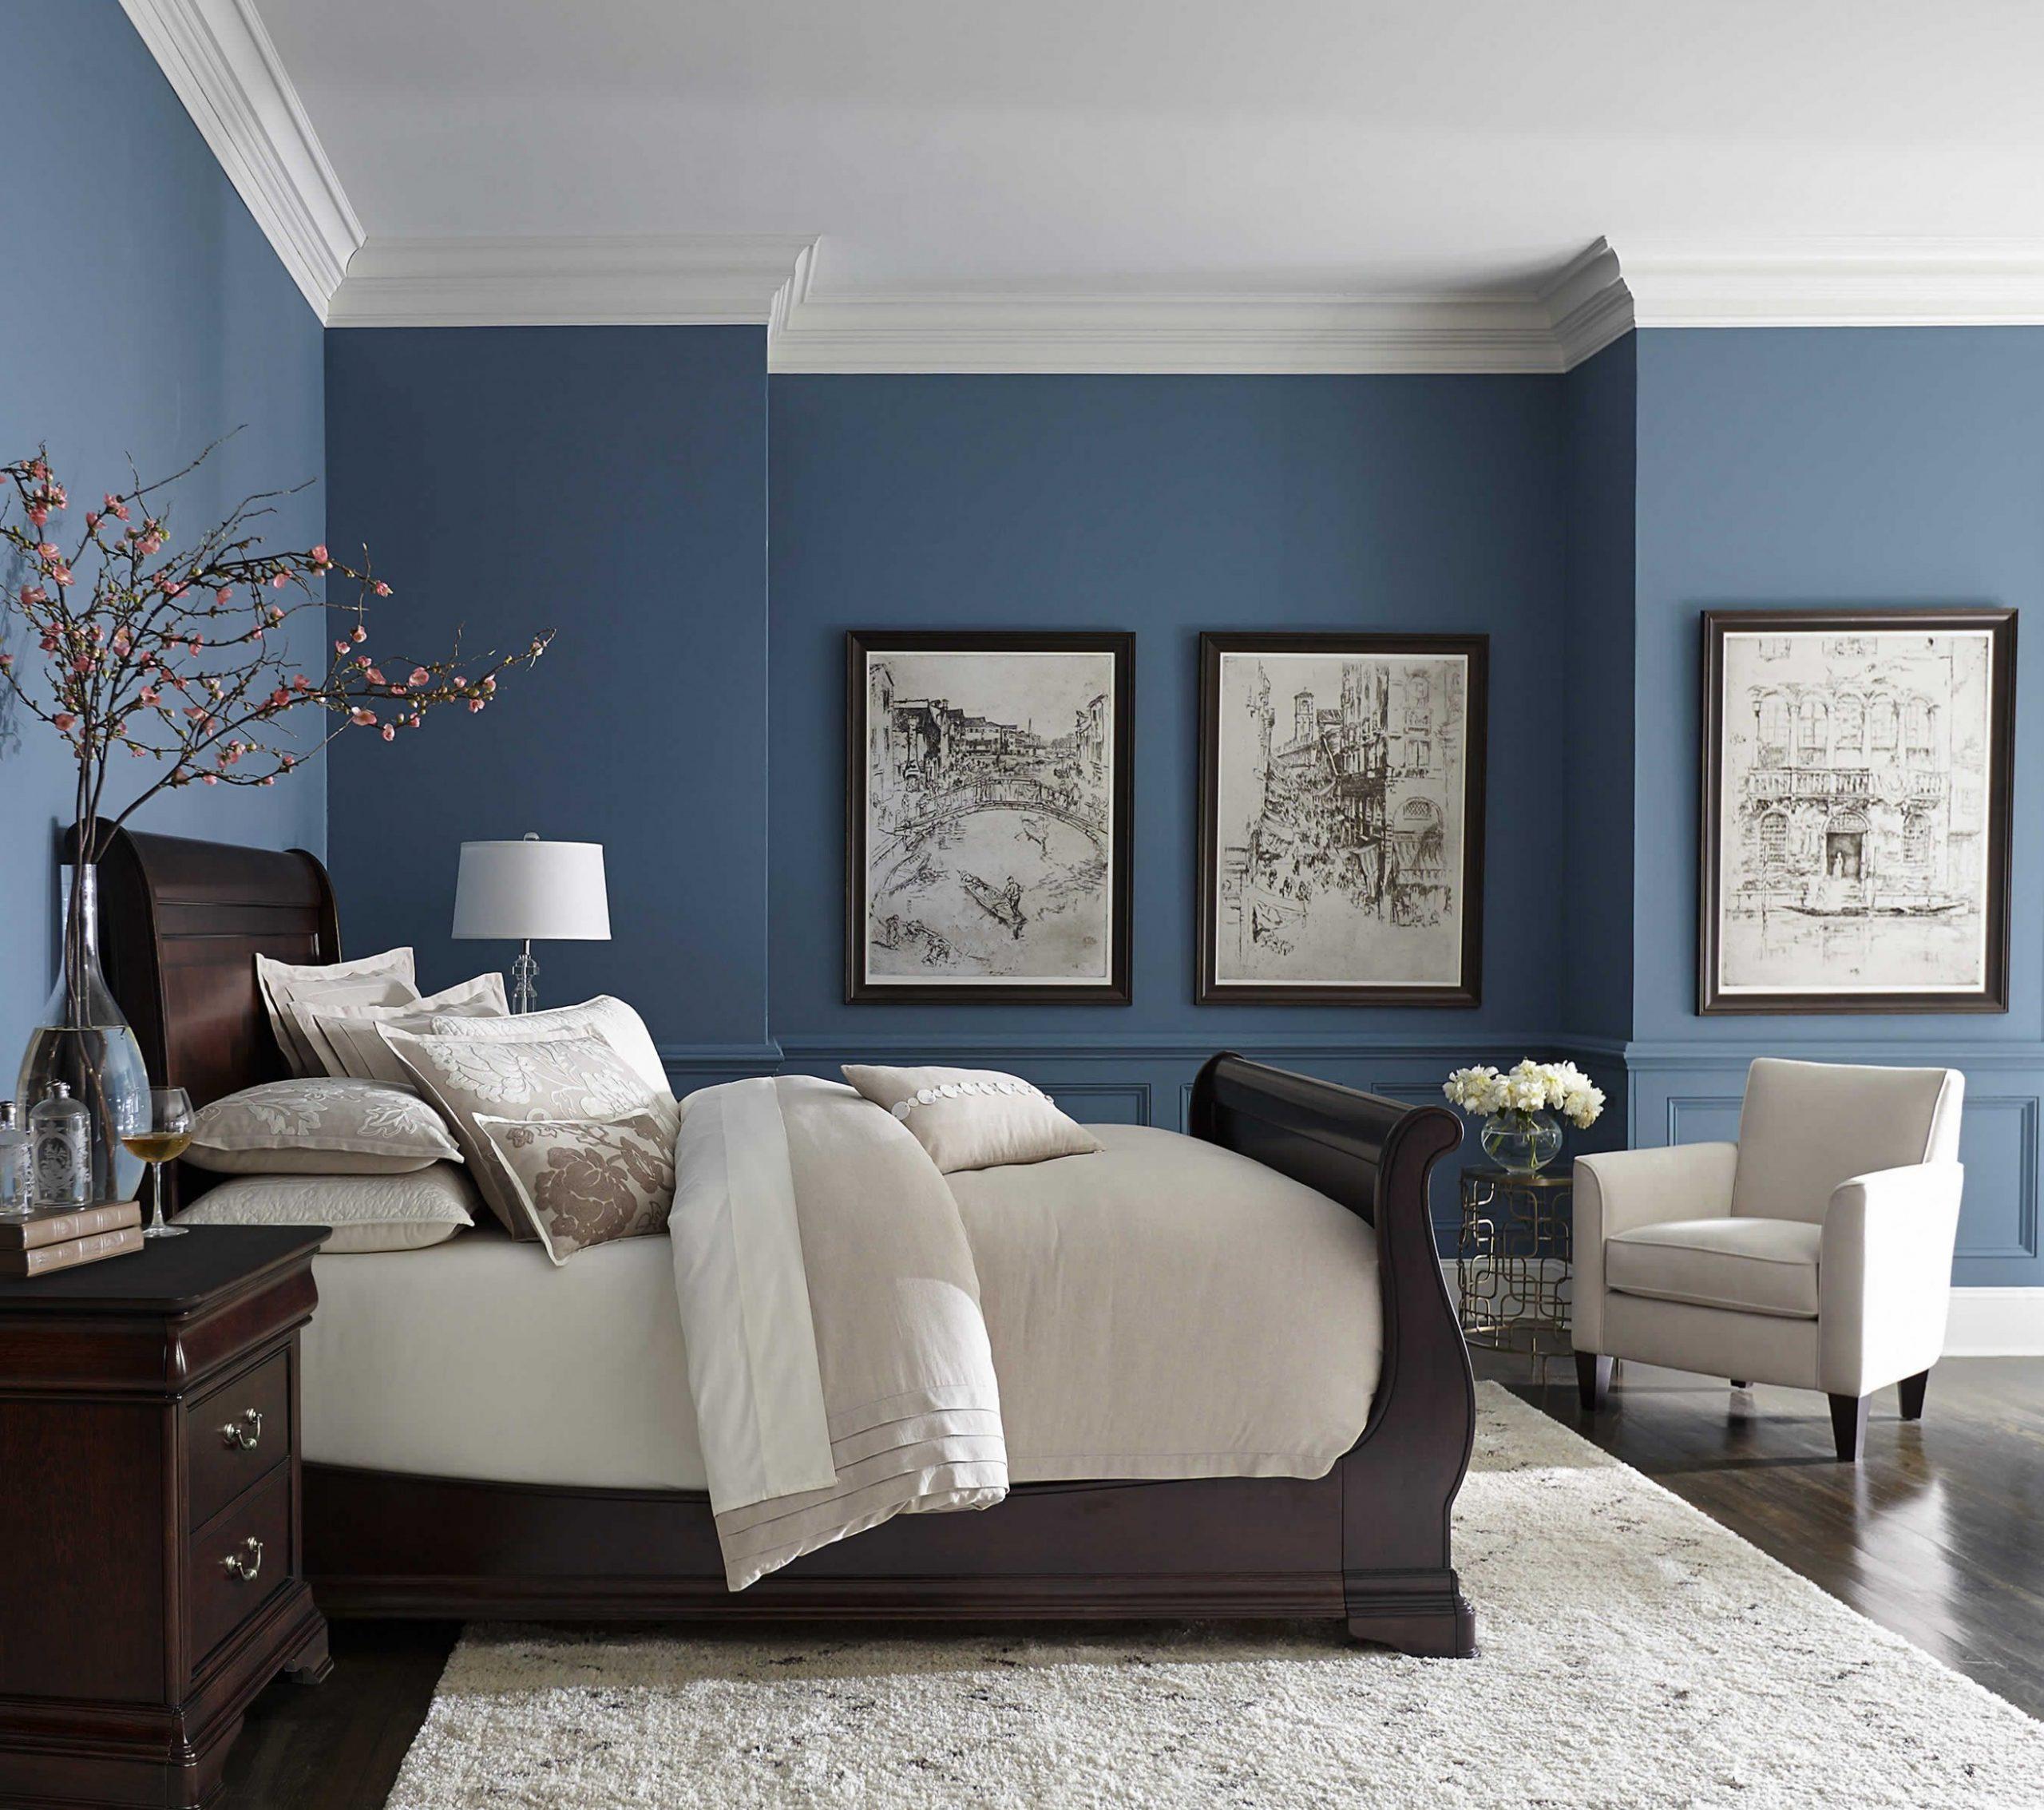 Effortlessly Elegant  Small master bedroom, Master bedrooms decor  - Bedroom Ideas In Blue